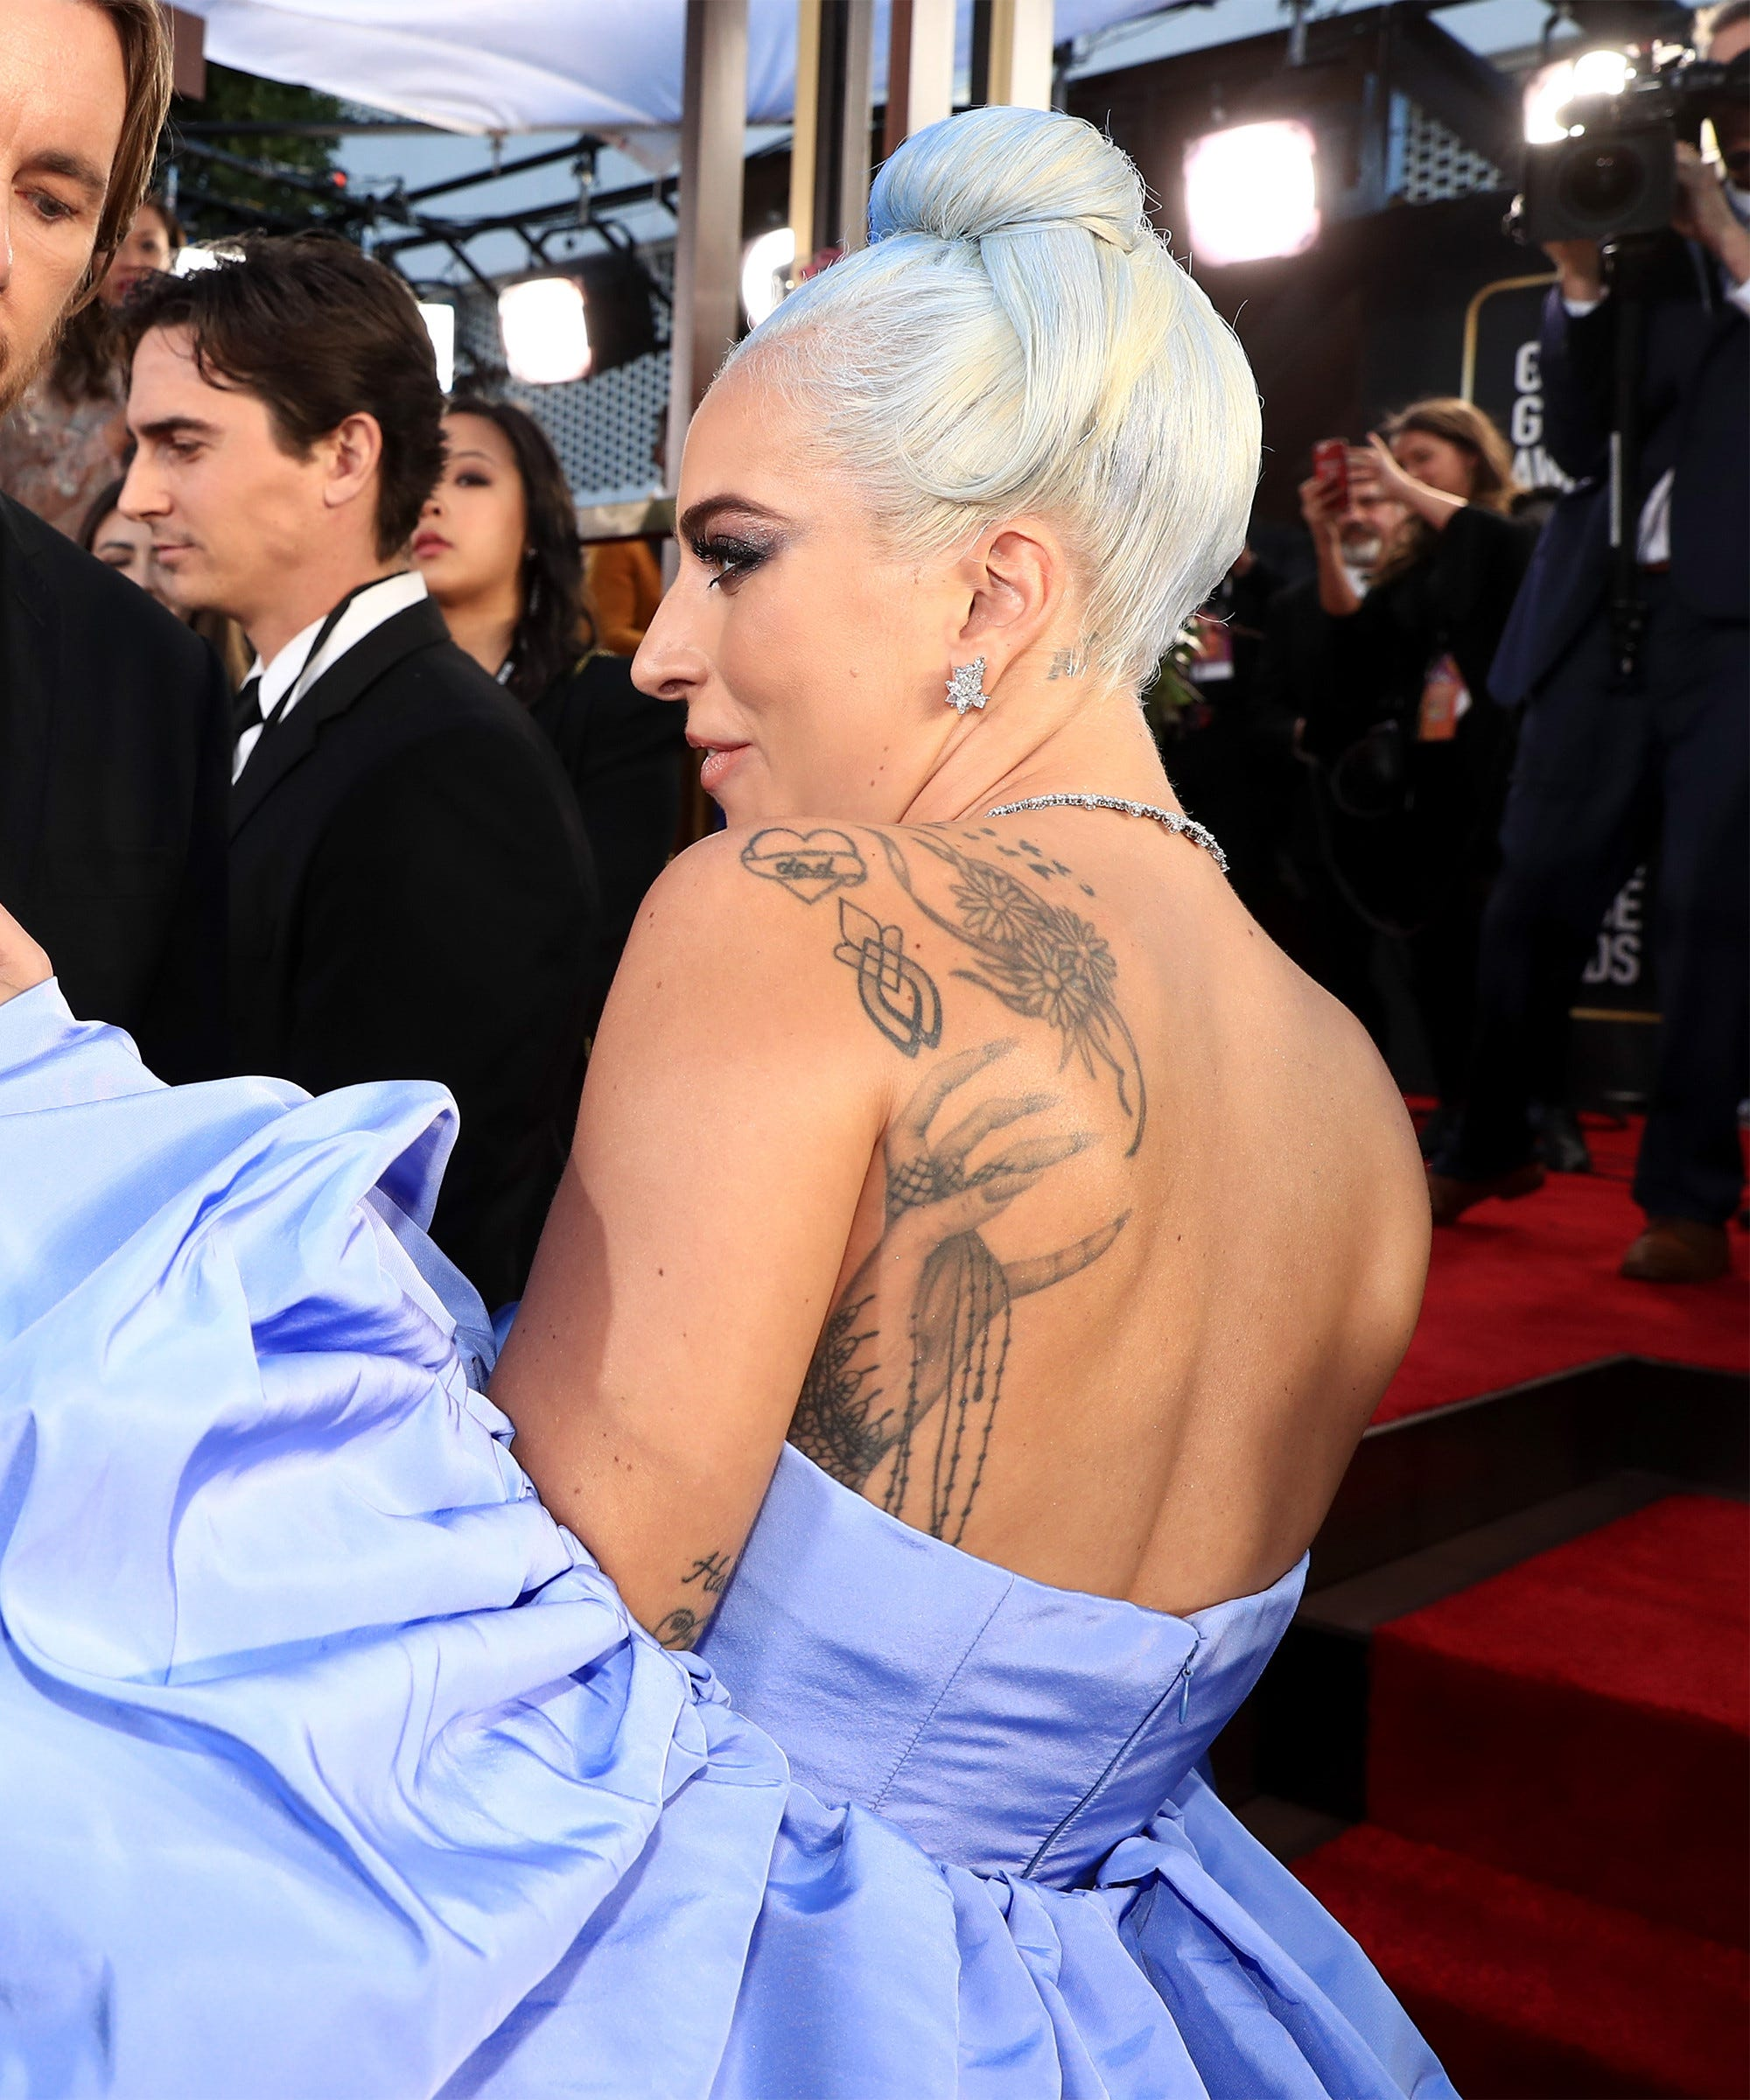 Lady Gaga Back Tattoos On Full Display At Golden Globes